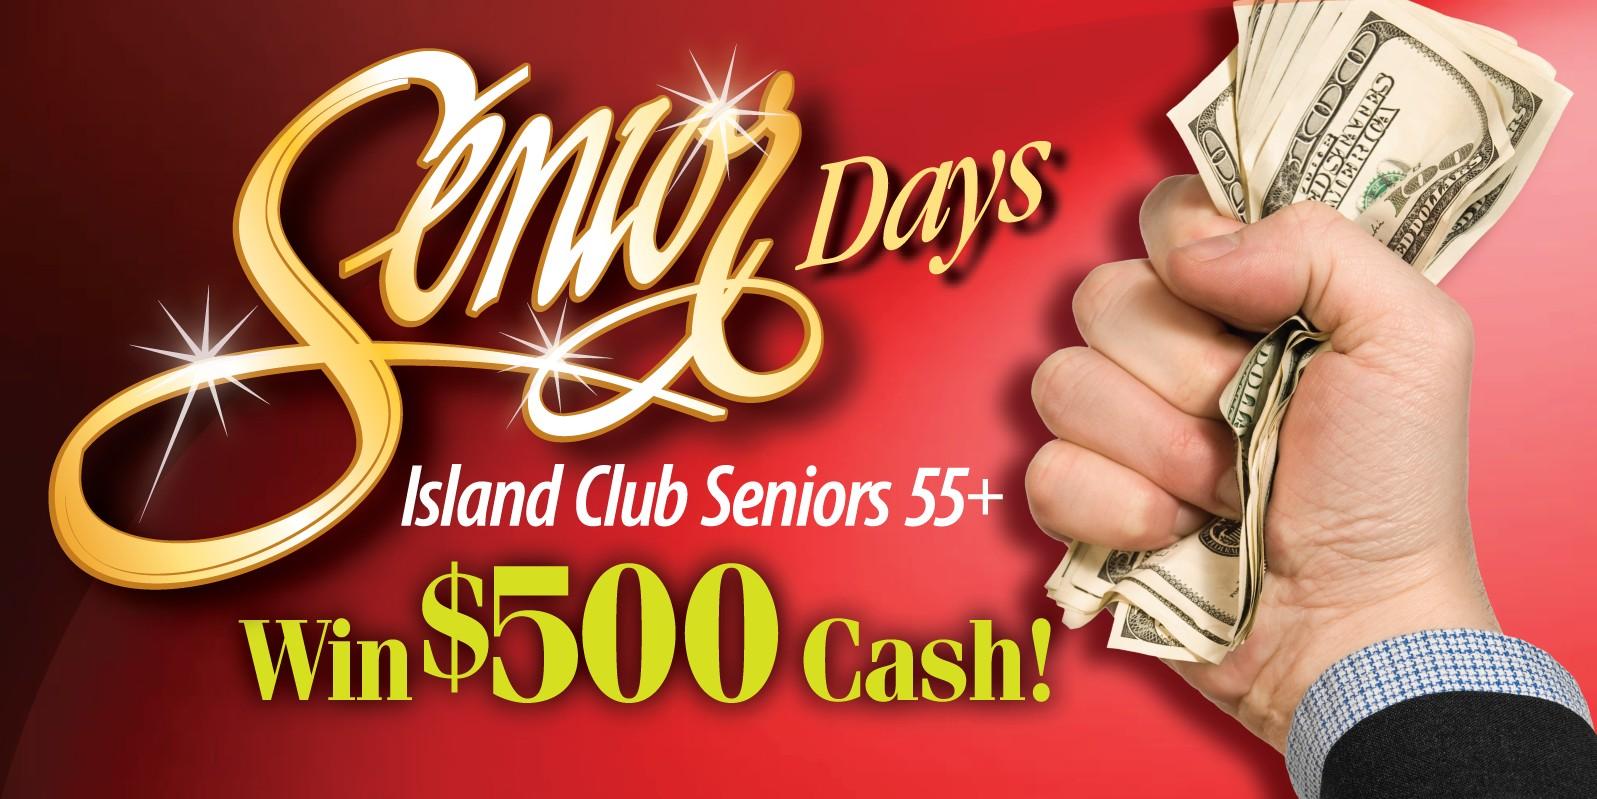 Seniors Win $500 Cash June '14